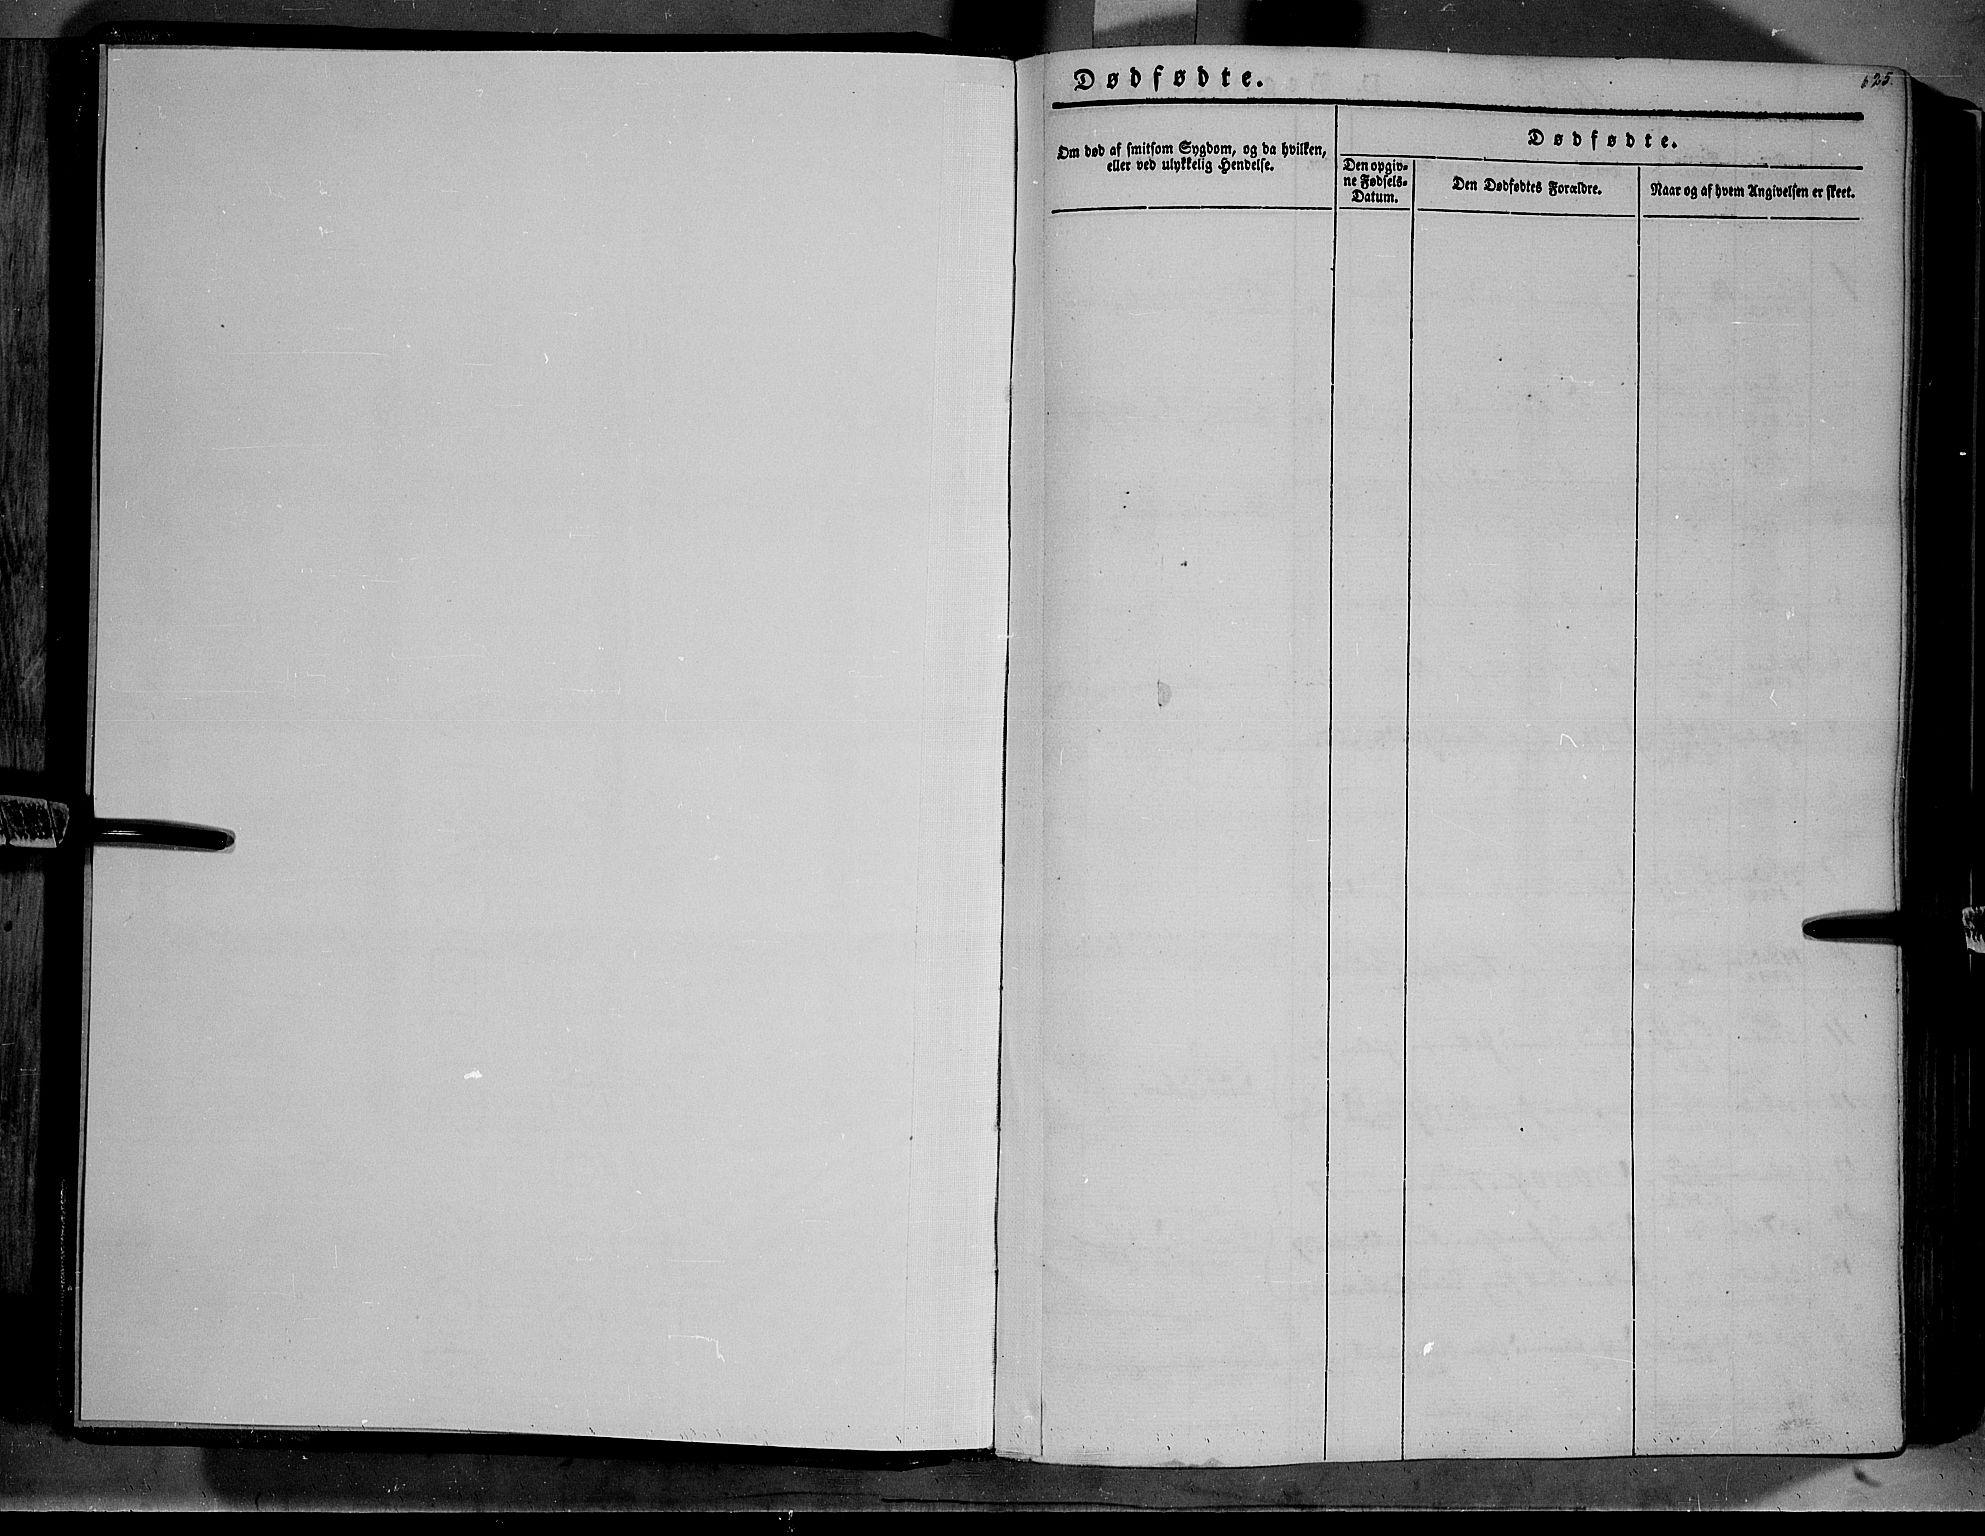 SAH, Lesja prestekontor, Ministerialbok nr. 6B, 1843-1854, s. 624-625